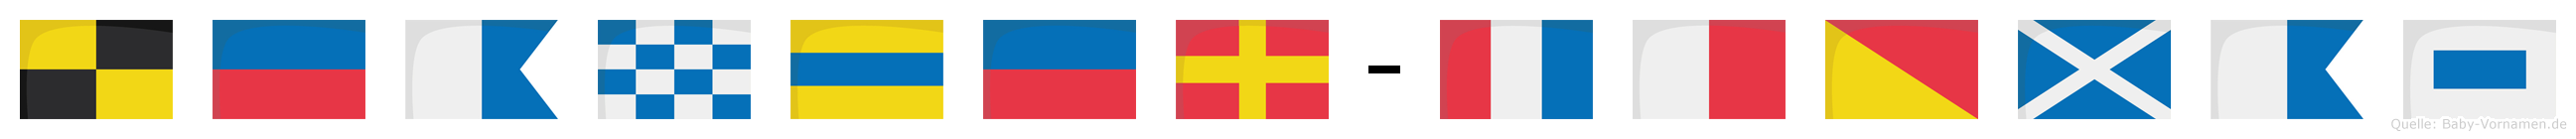 Leander-Thomas im Flaggenalphabet